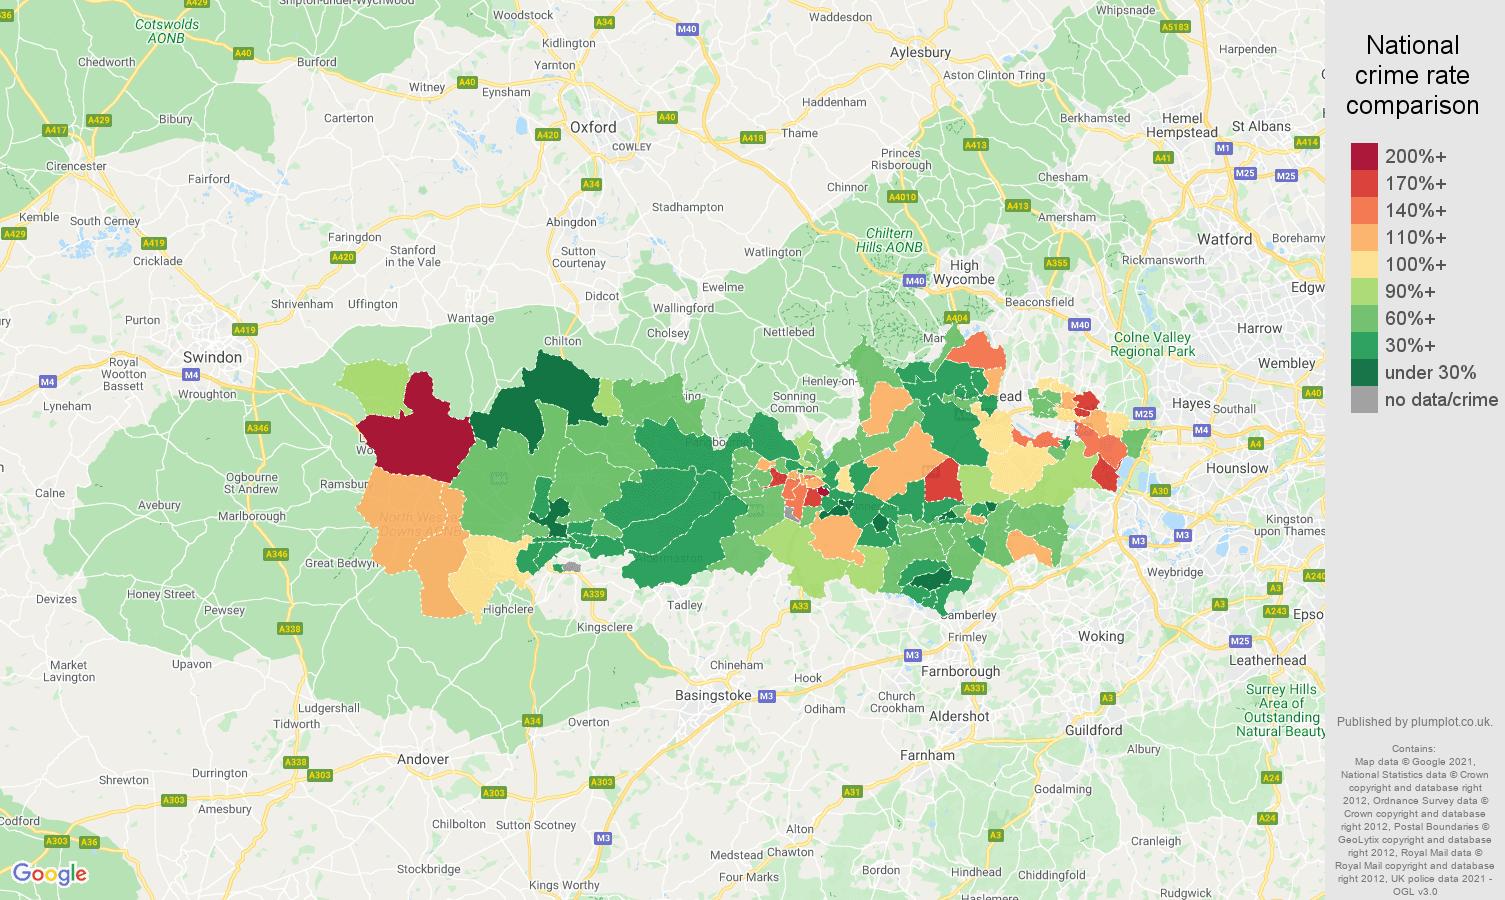 Berkshire burglary crime rate comparison map